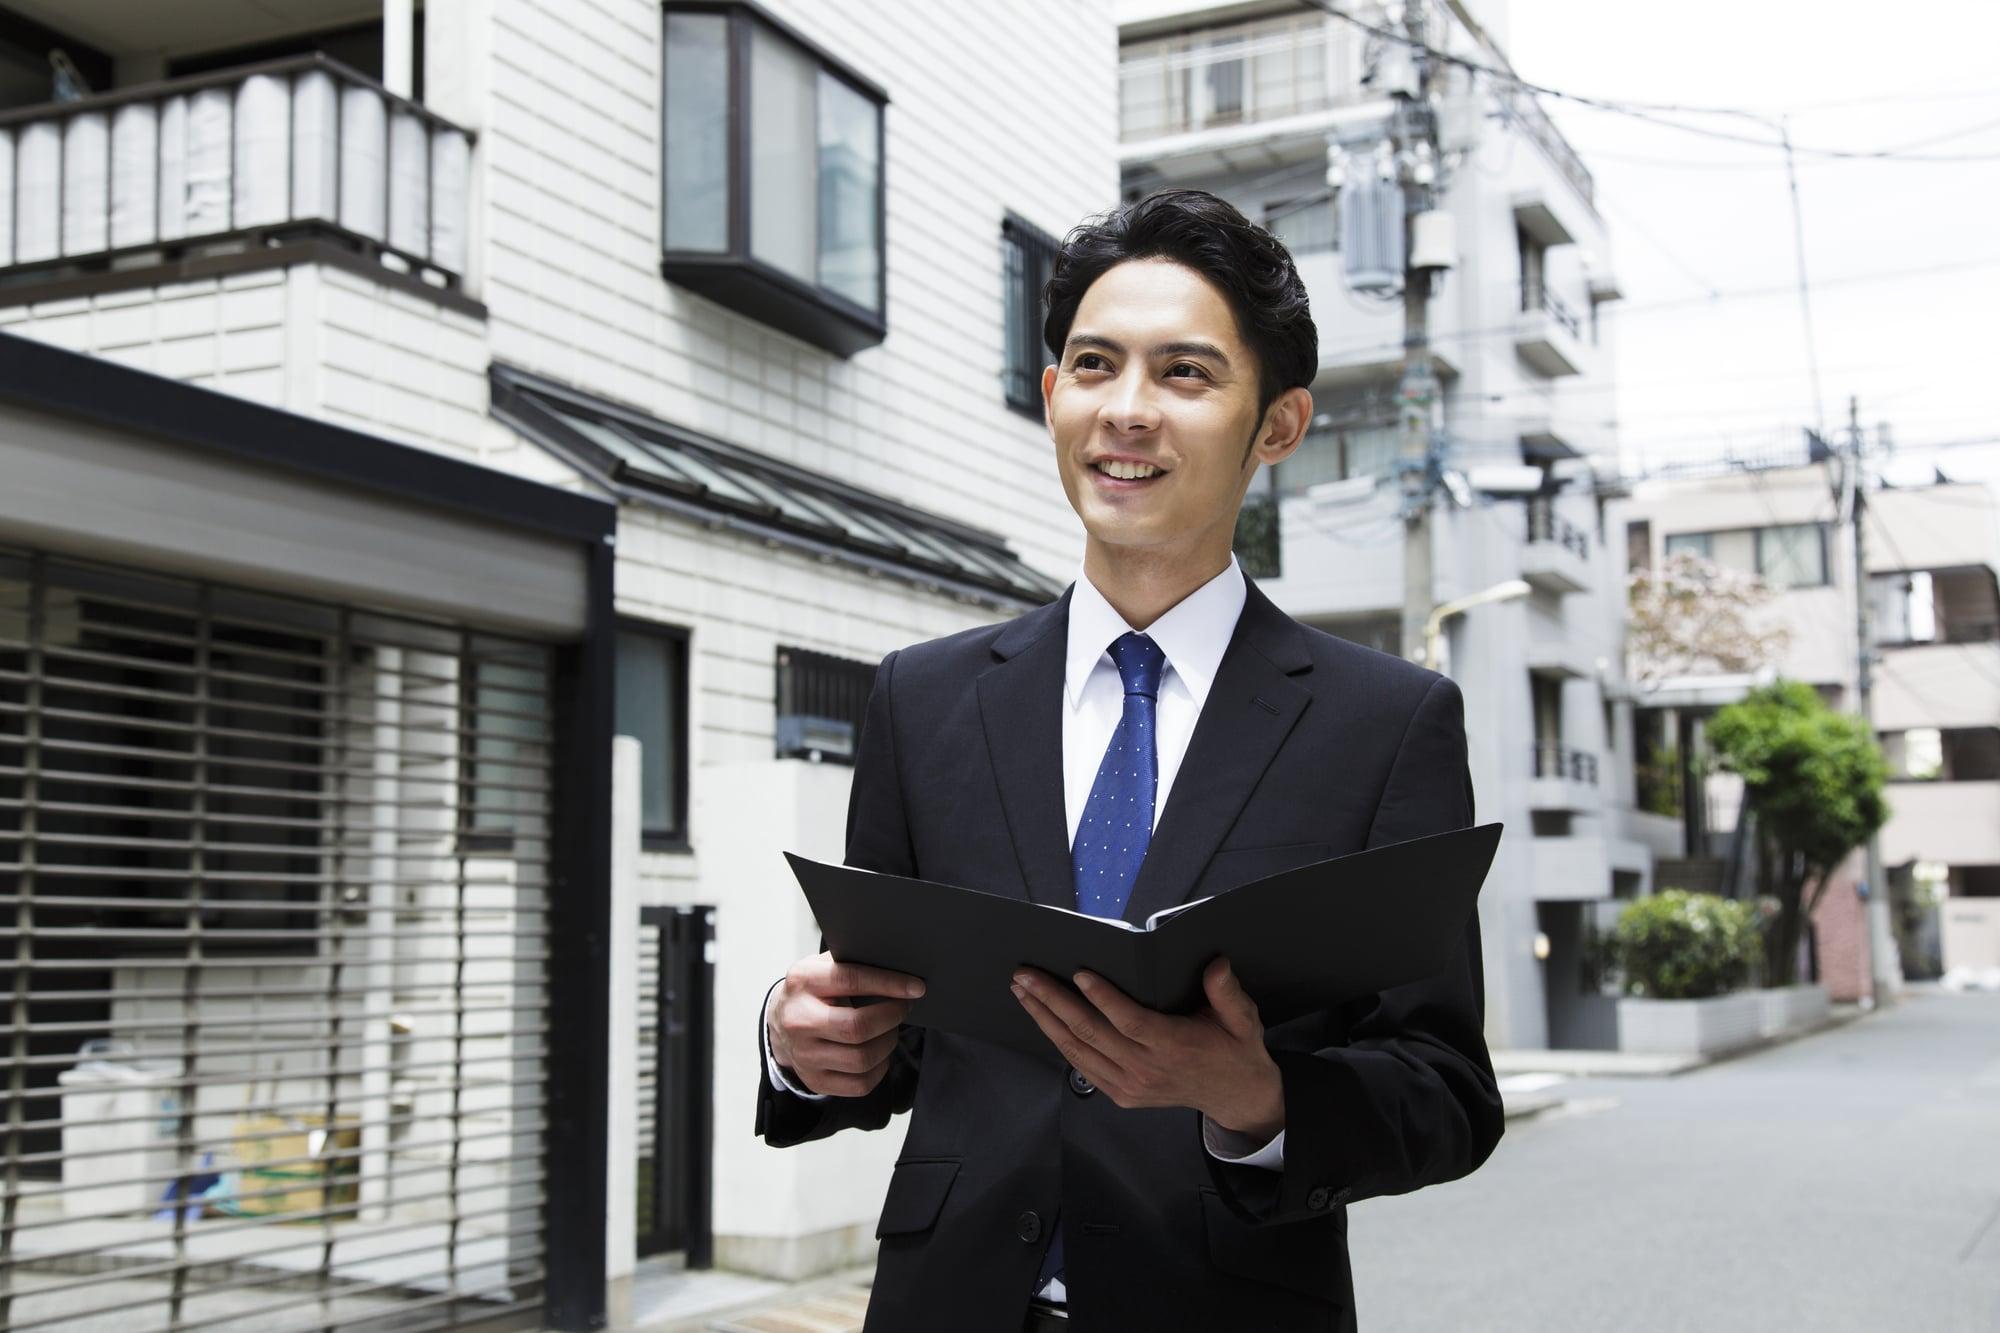 Study_Room_business